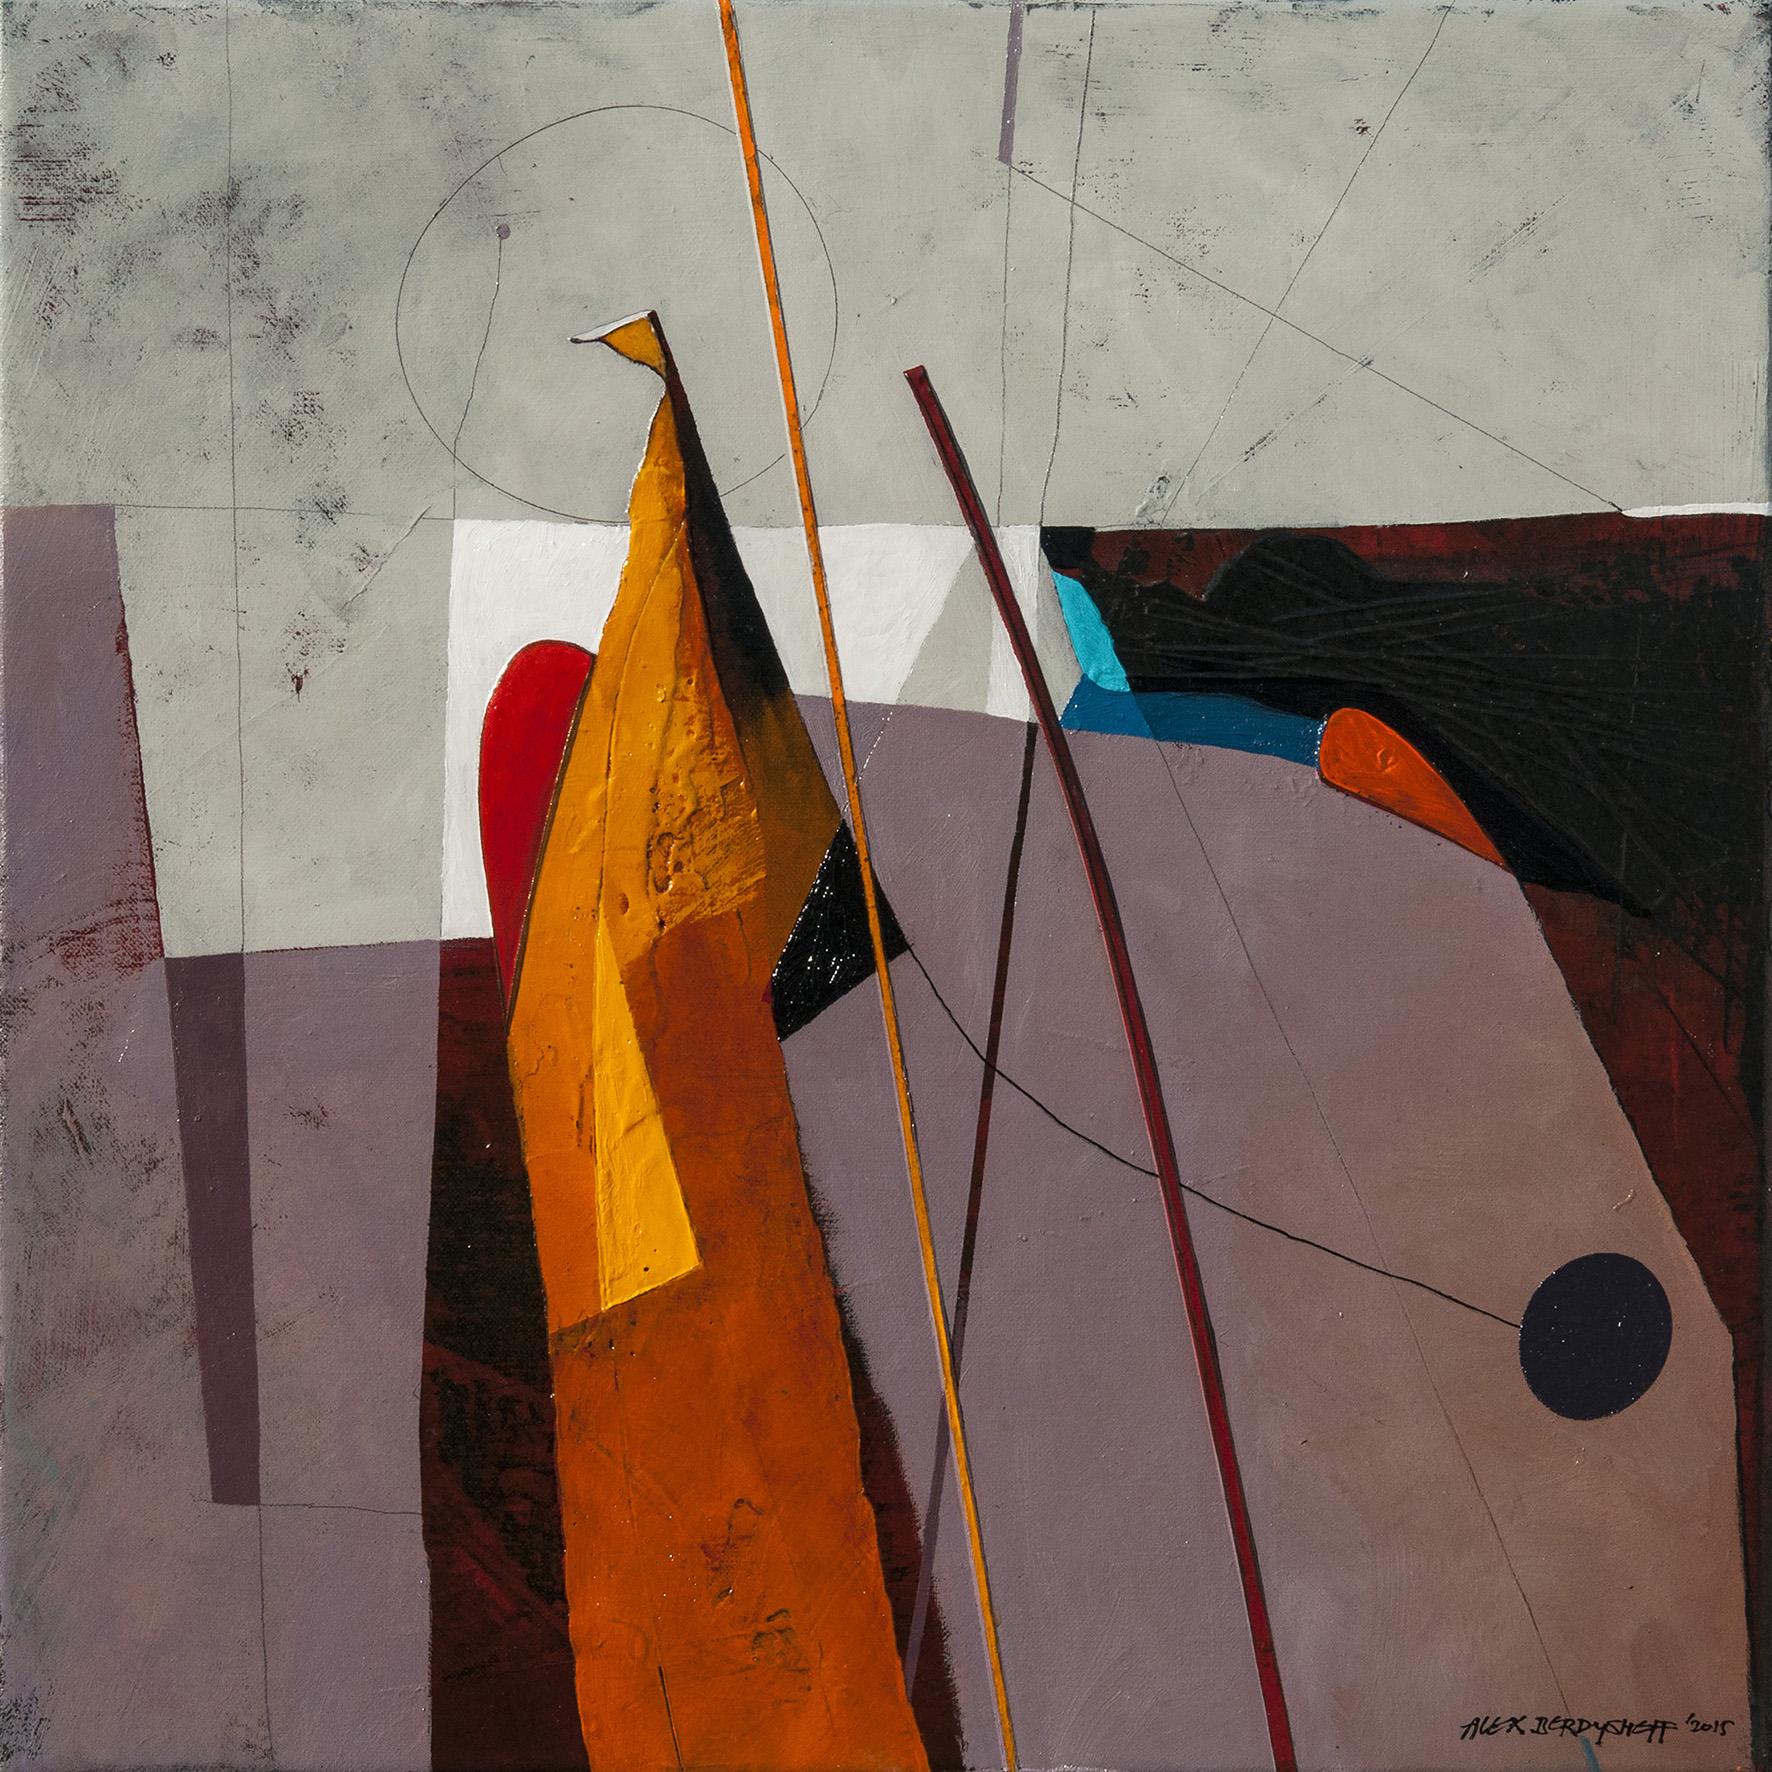 Rhythm VII, oil on canvas, 46x46 cm, 2015